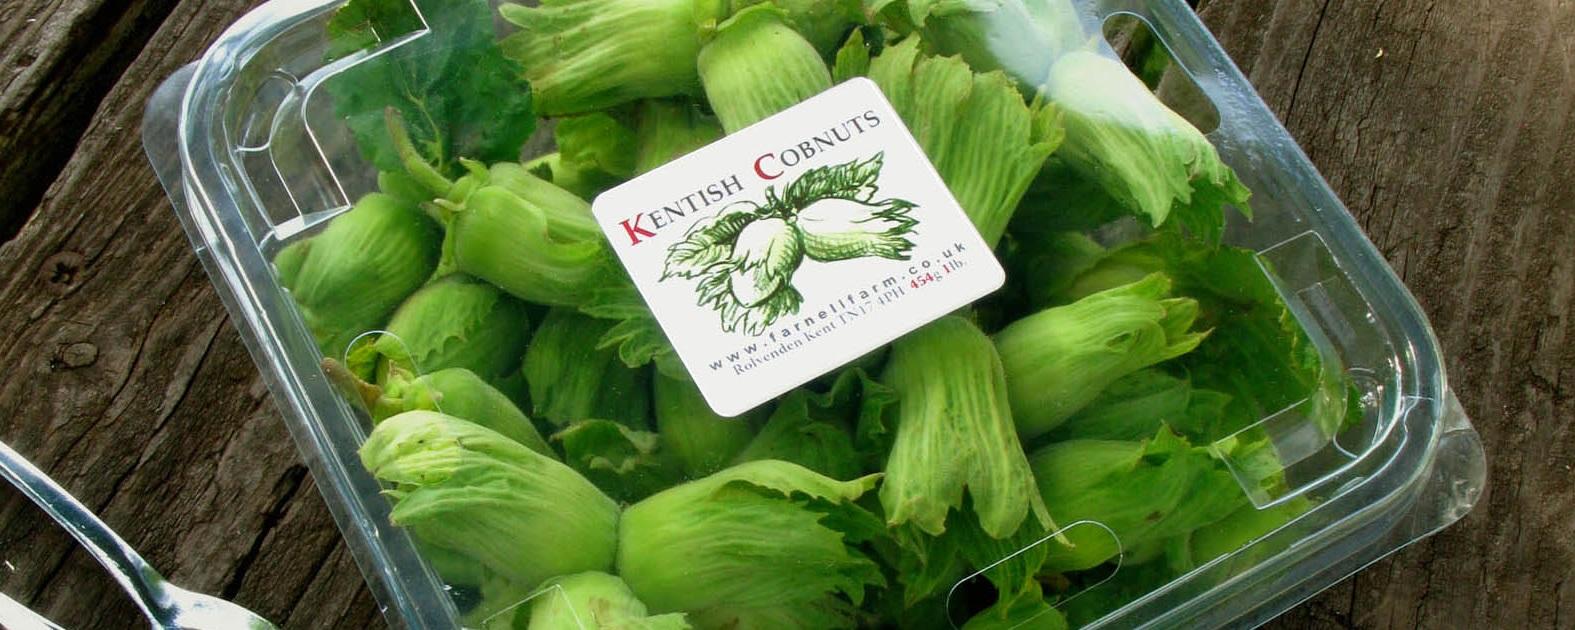 Kentish Cobnuts - We sell seasonal fresh Cobnuts, and dehusked Cobnuts.